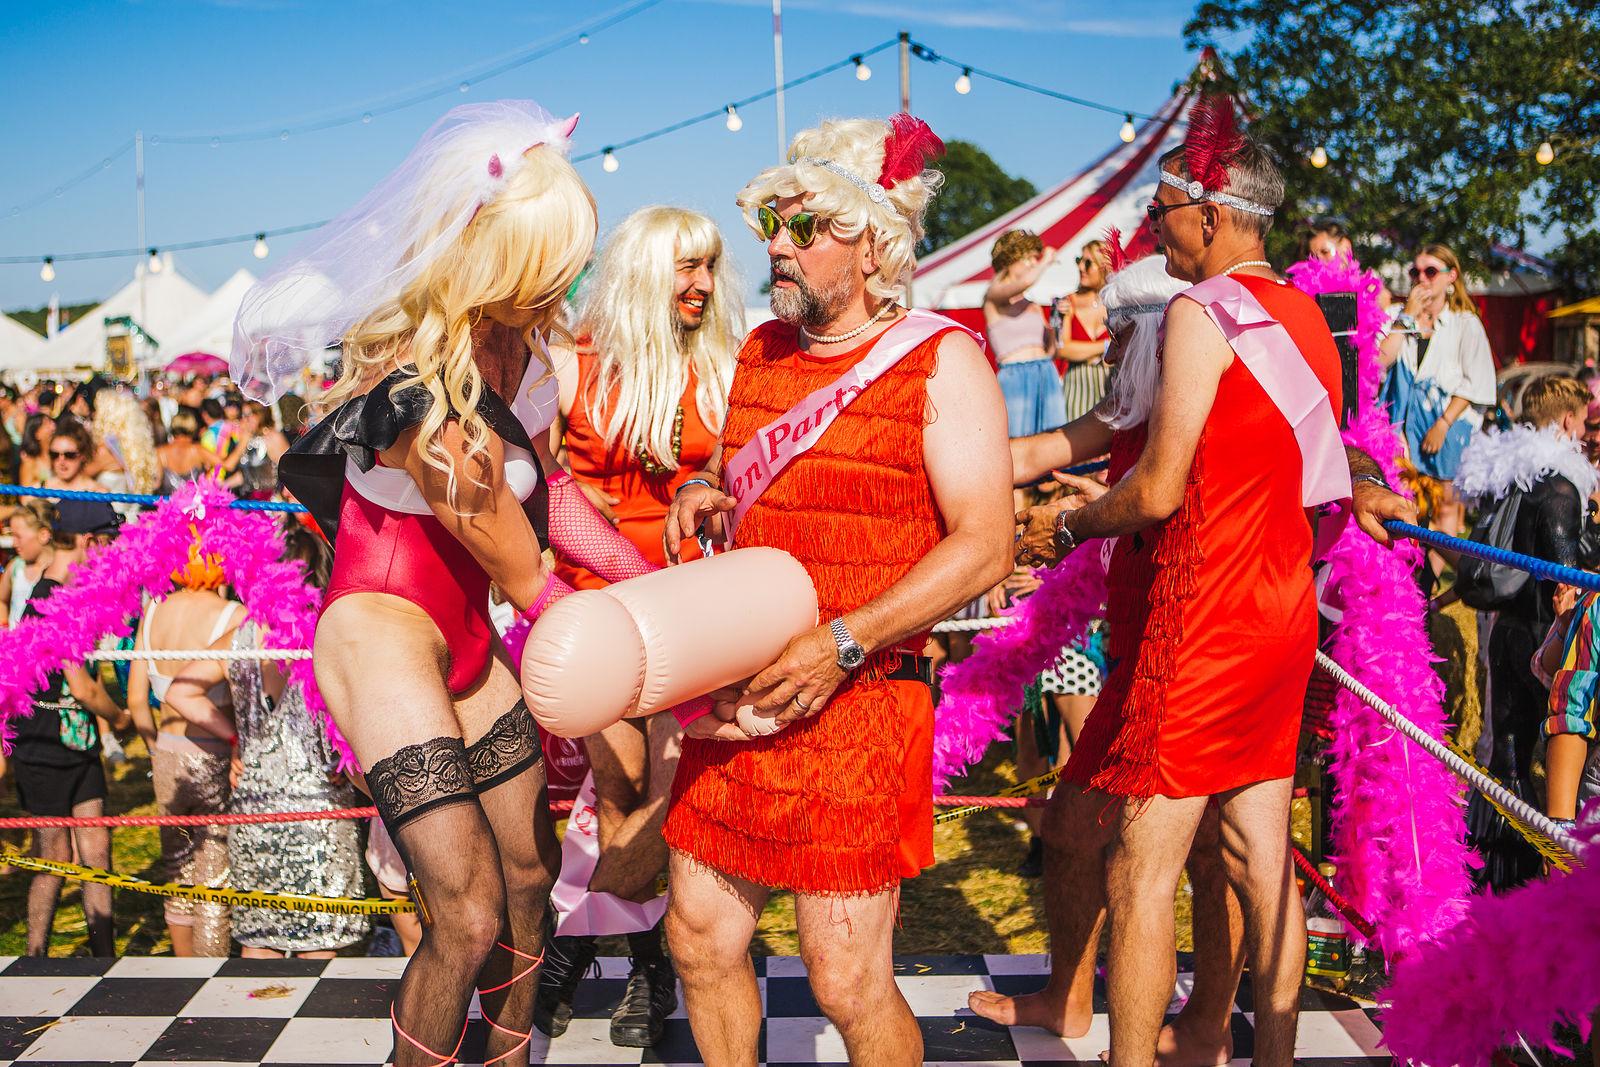 Horny Hen Party